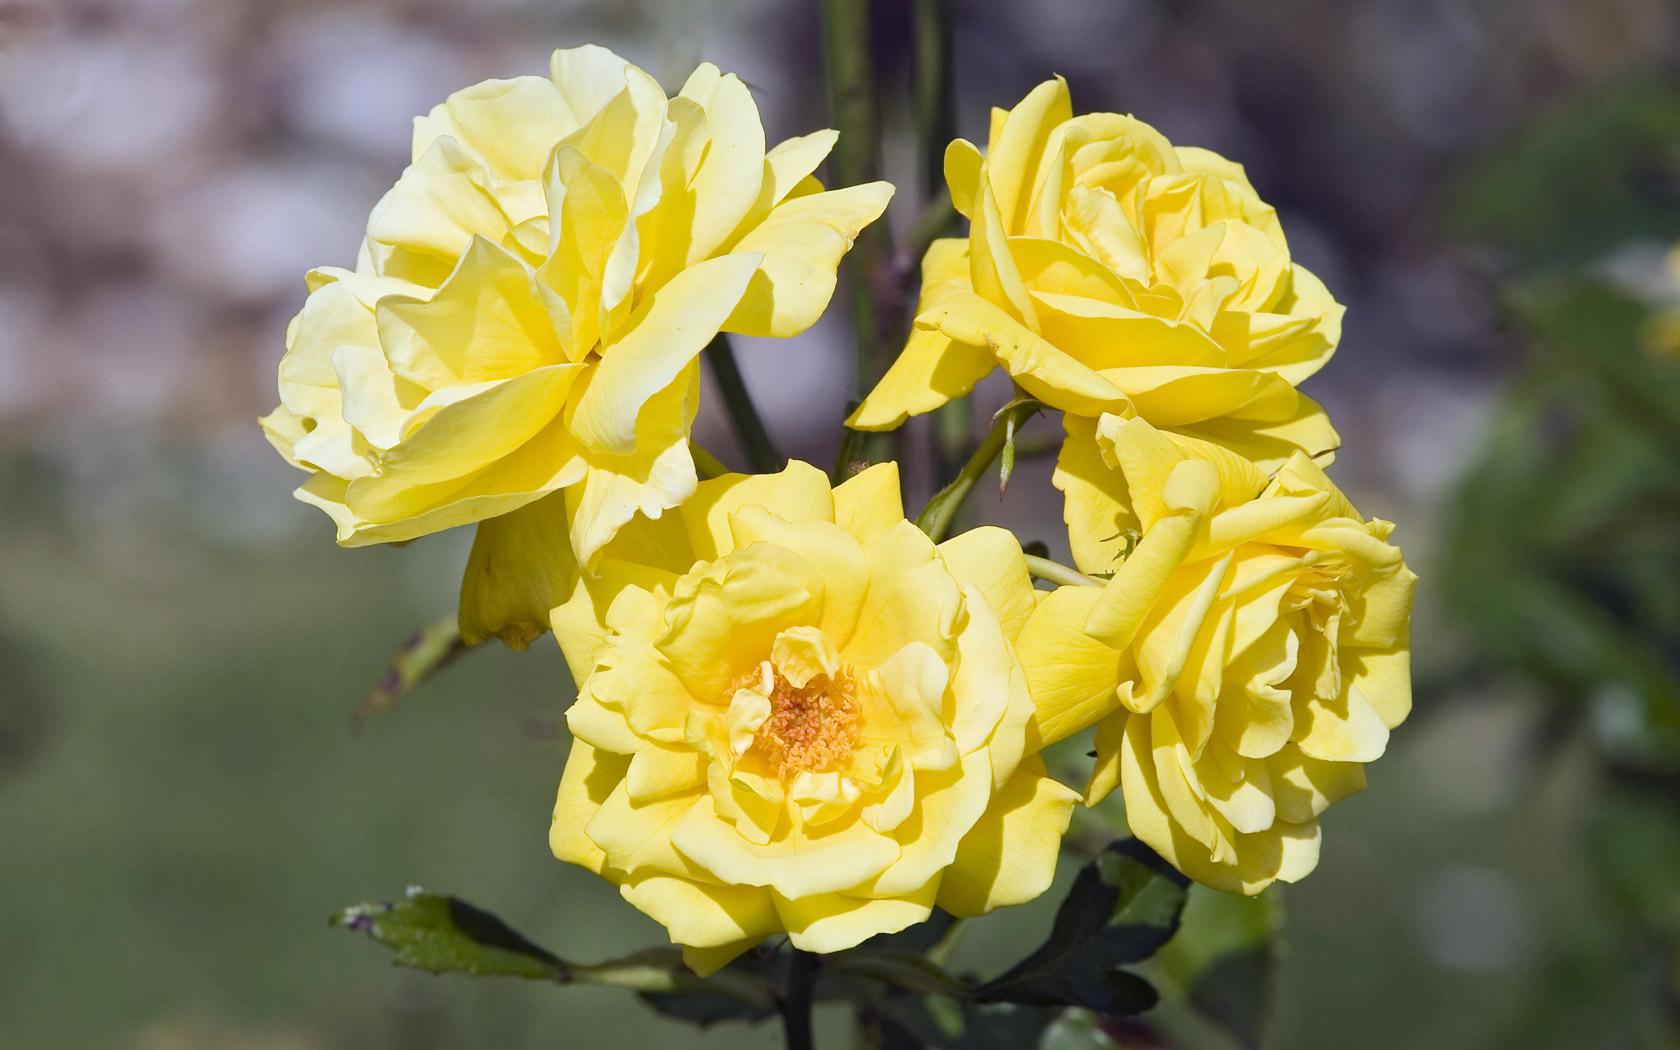 yellow roses 29668